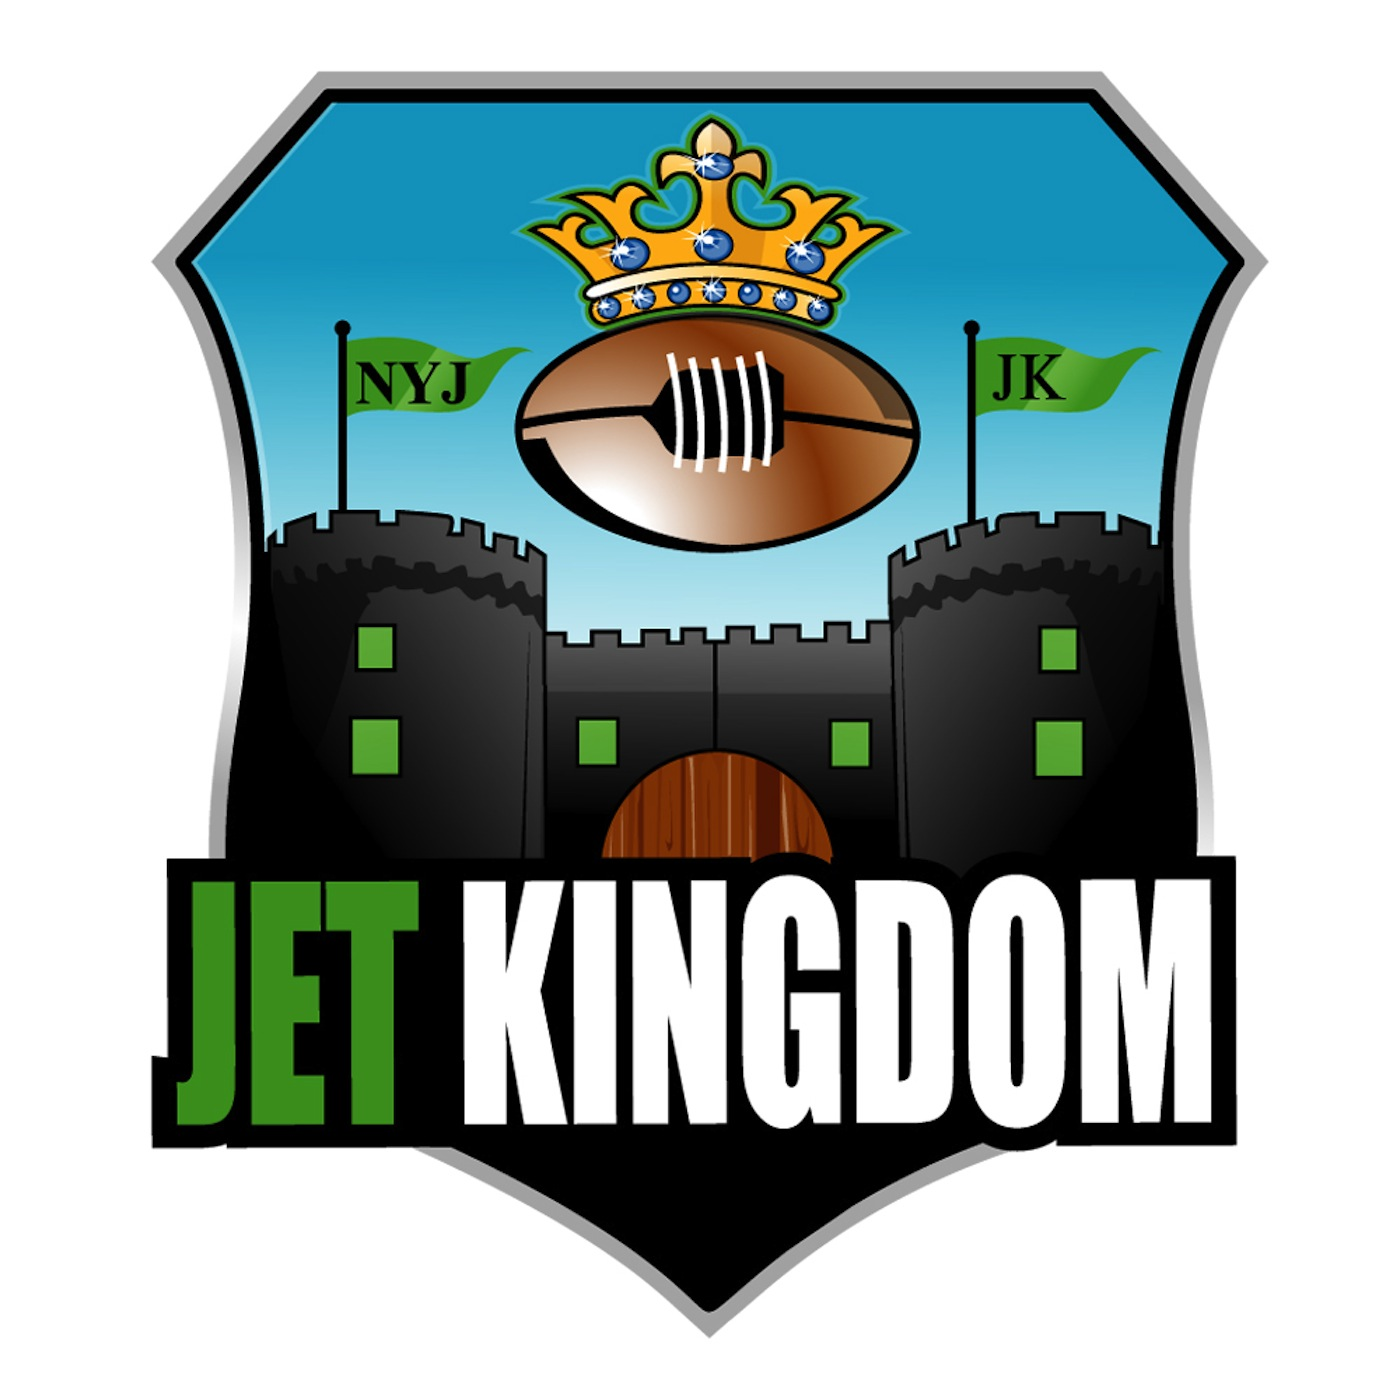 Jet Kingdom - New York Jets Podcast  since 2007 show art